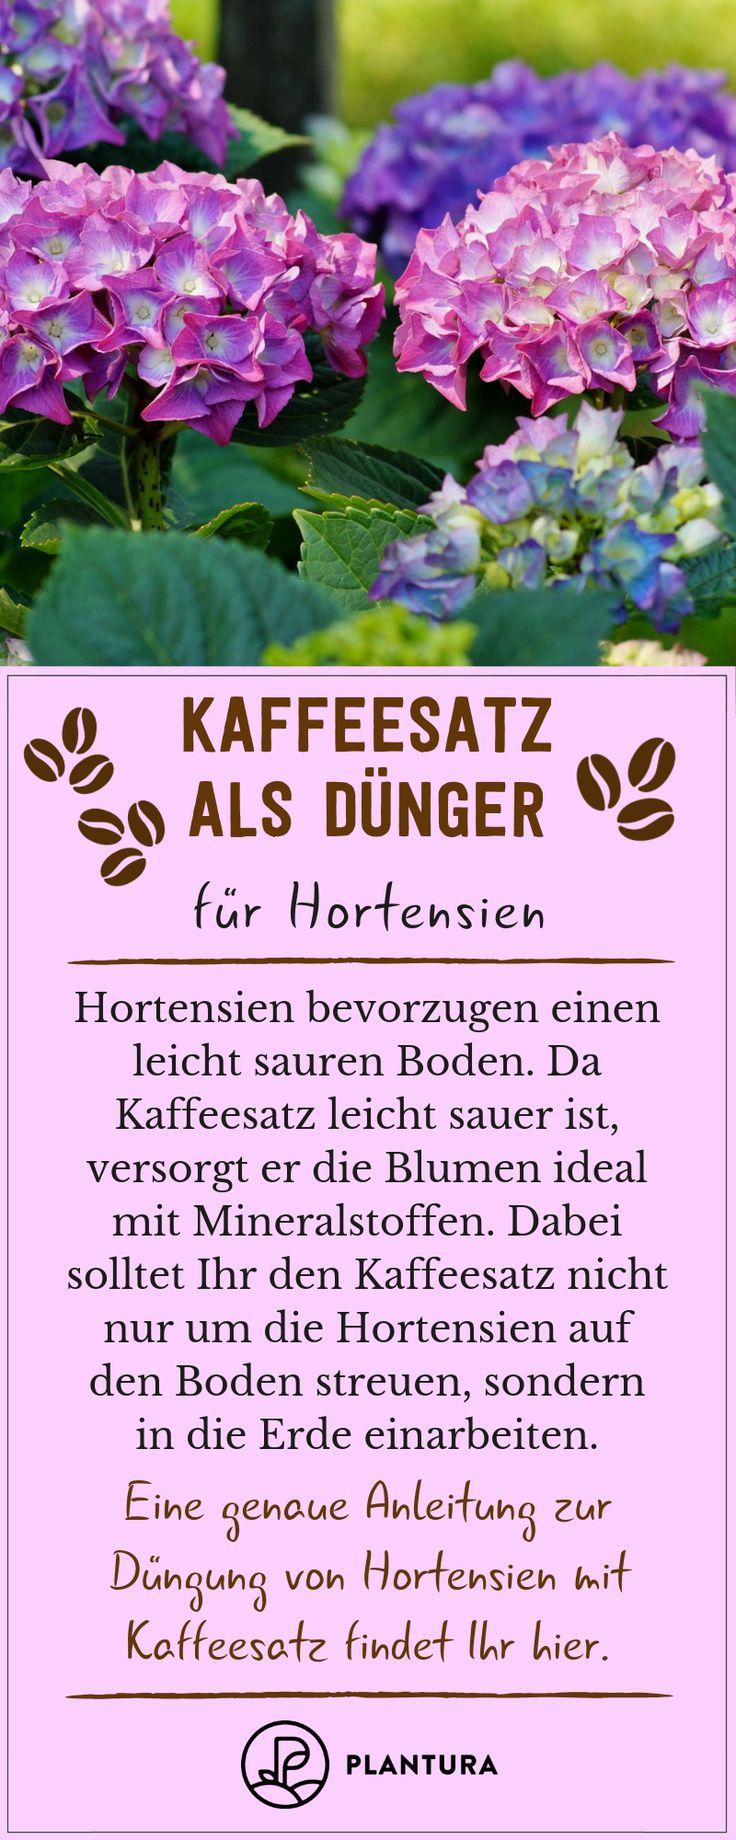 Kaffeesatz als Dünger: Verwendung & Vorteile des Hausmittels – Plantura | Garten Ideen & Tipps | Gemüse, Obst, Kräuter